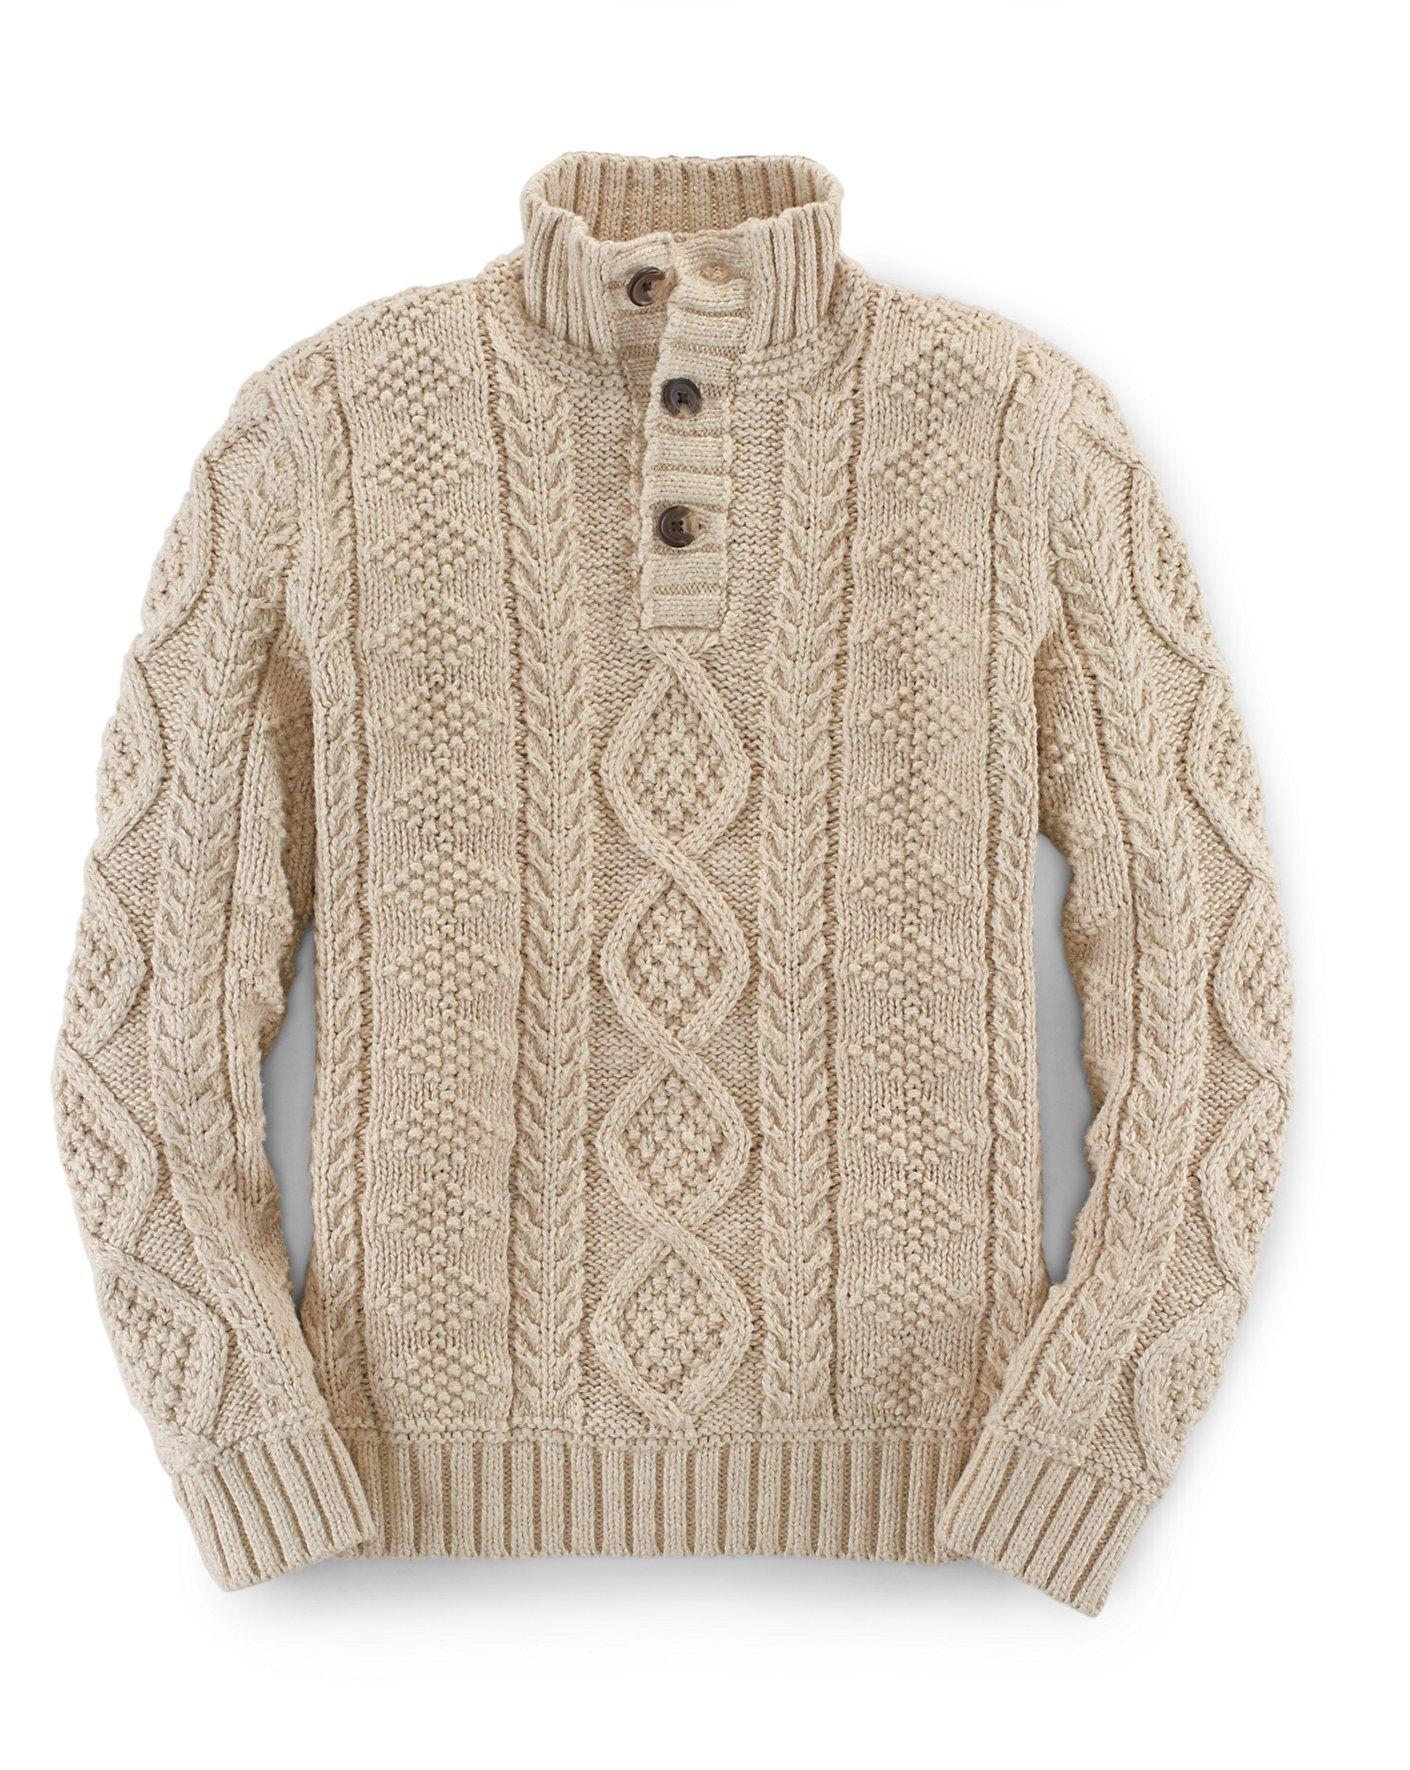 Aran-Knit Cotton Sweater - Jumpers Boys' 6-14 Years - Ralph Lauren ...